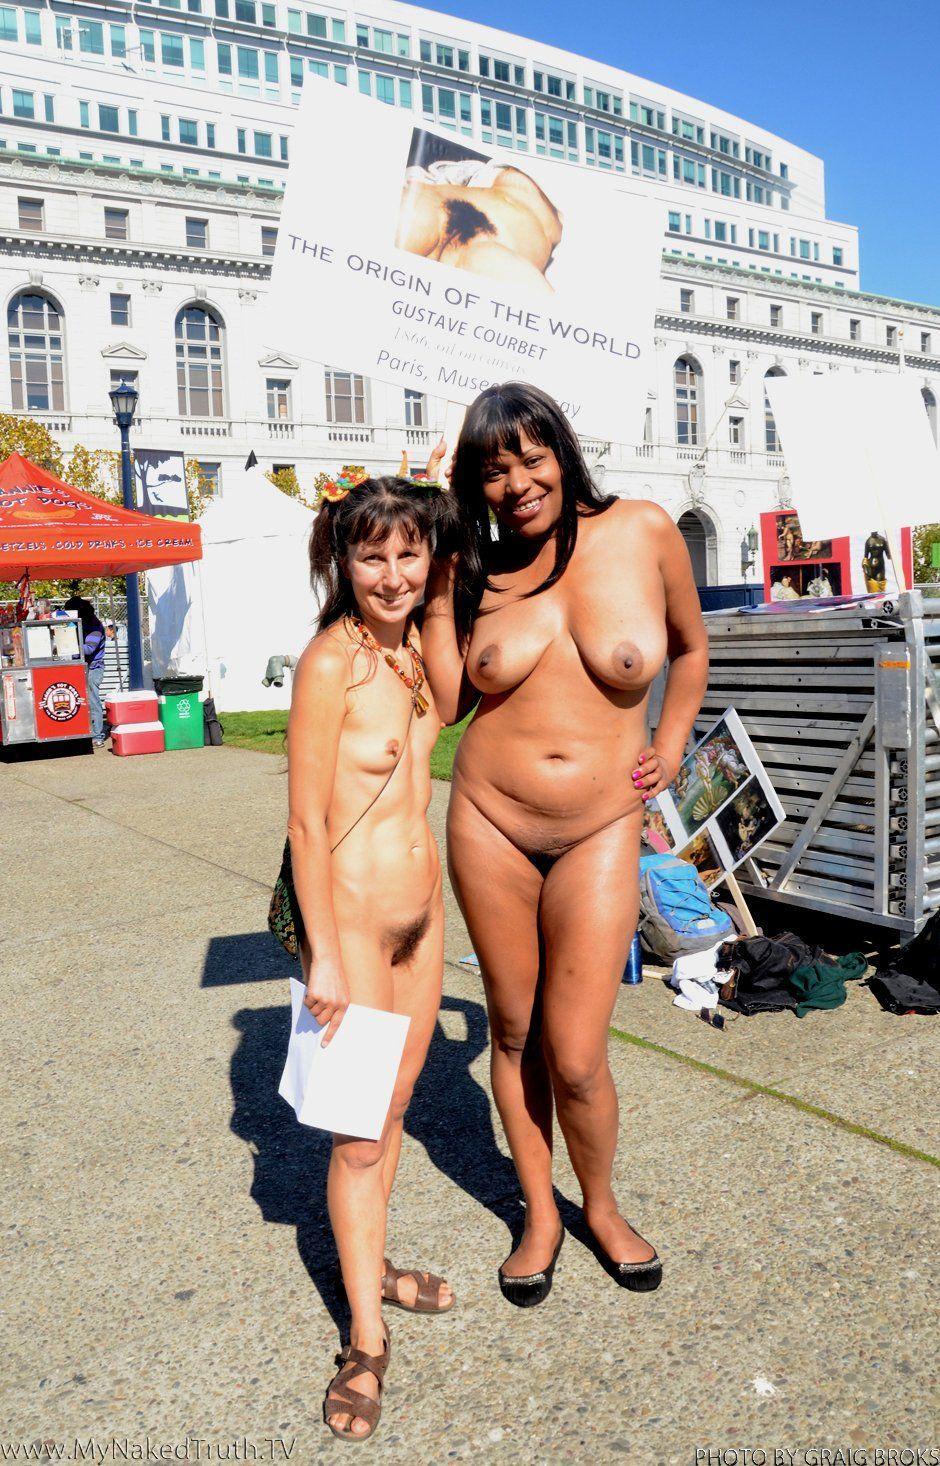 Right! Nude nudist